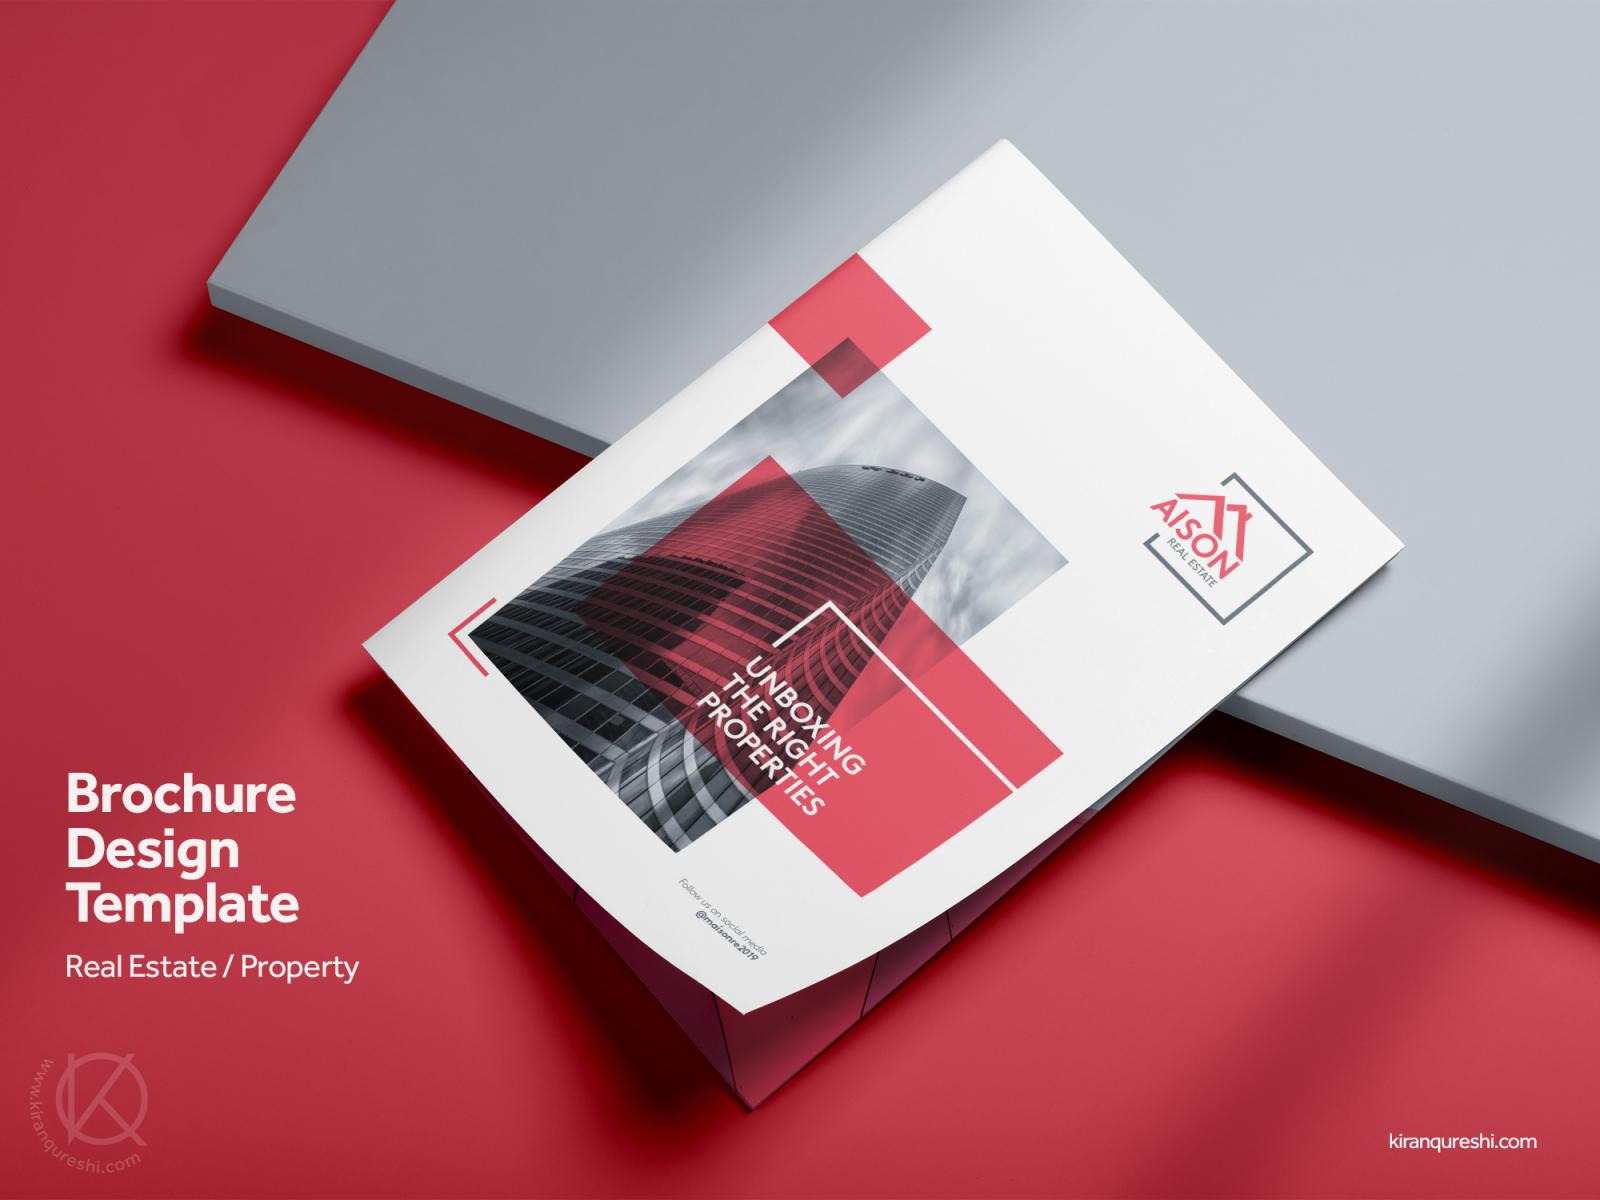 Company Profile Brochure | Real Estate & Property by Kiran